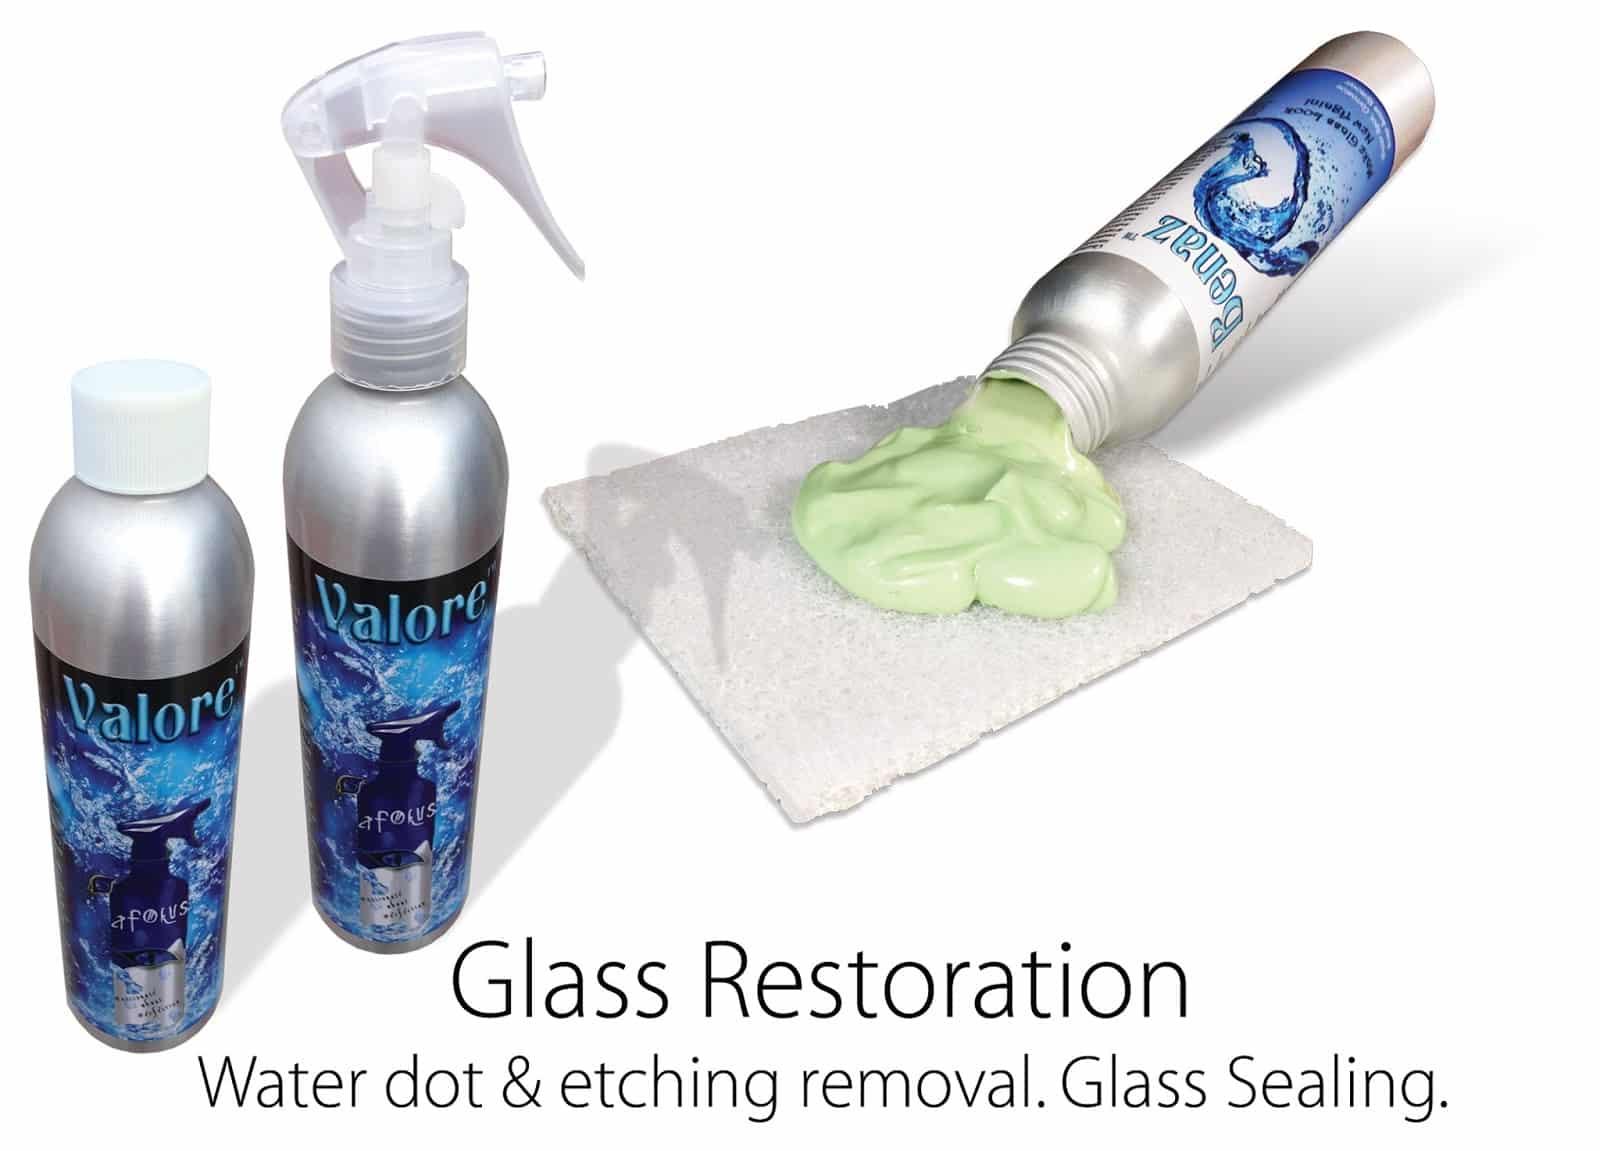 Glass Restoration Products - pFOkUS®